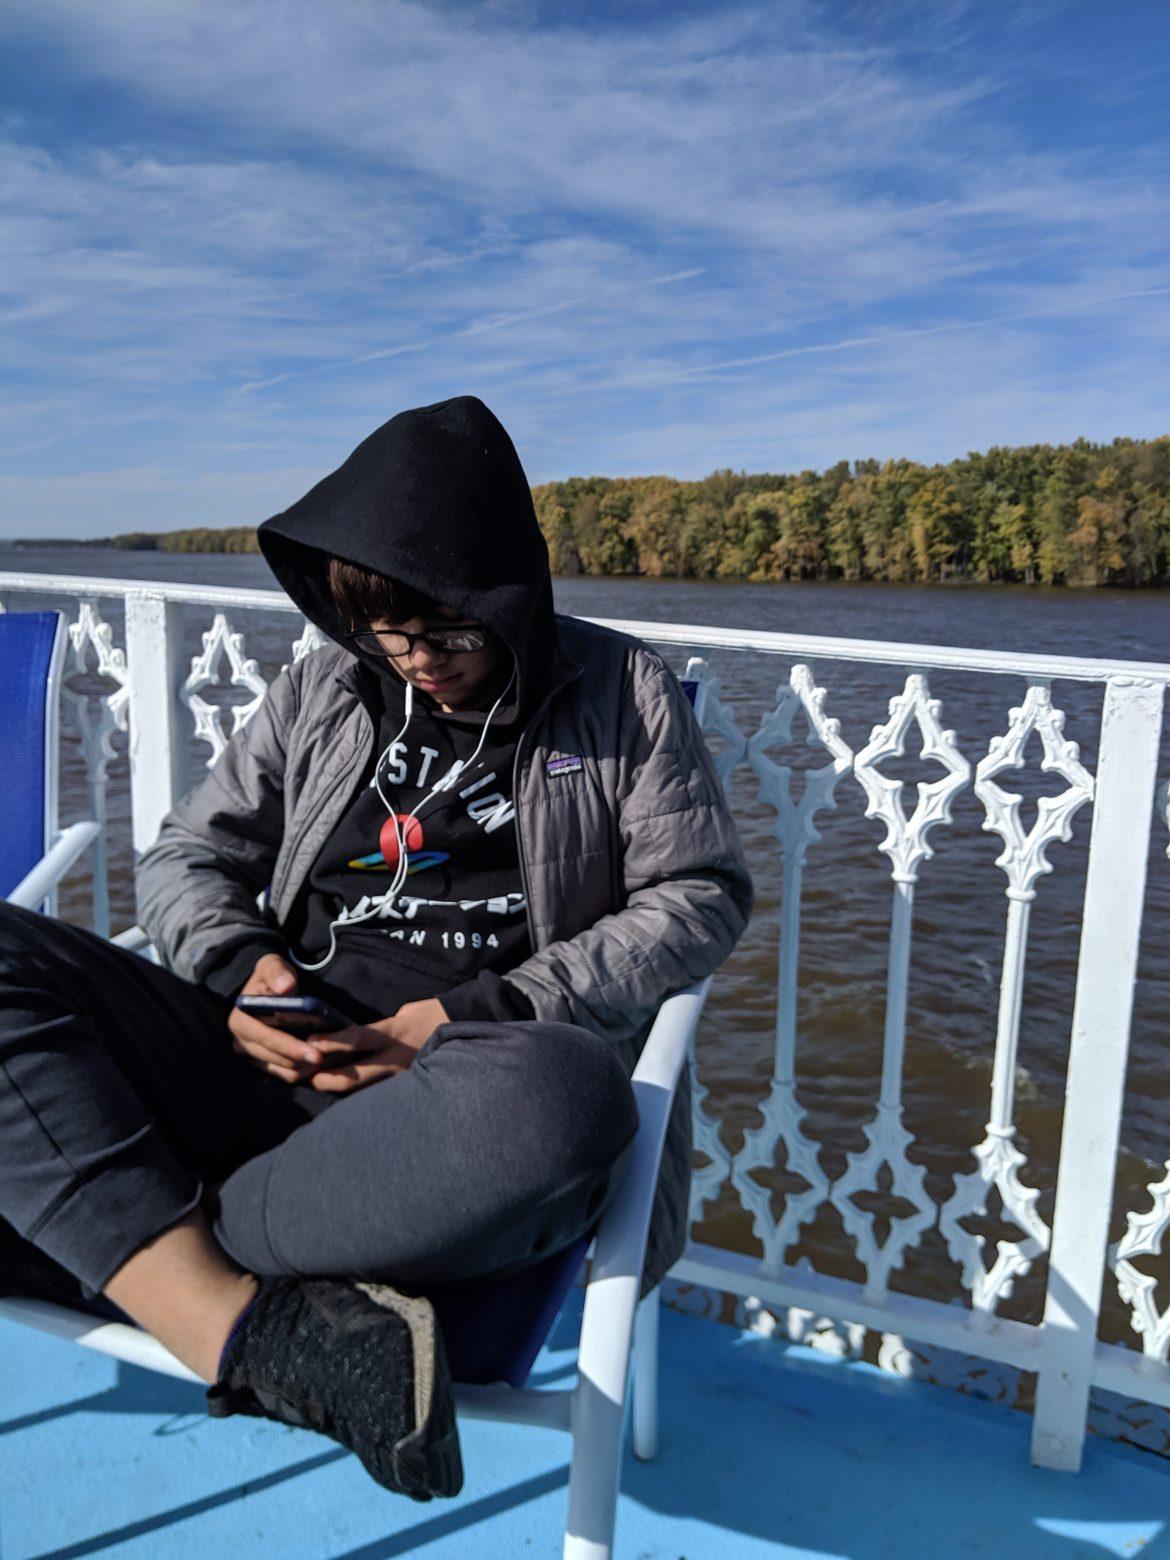 Riverboat CruiseIMG_20191018_140048